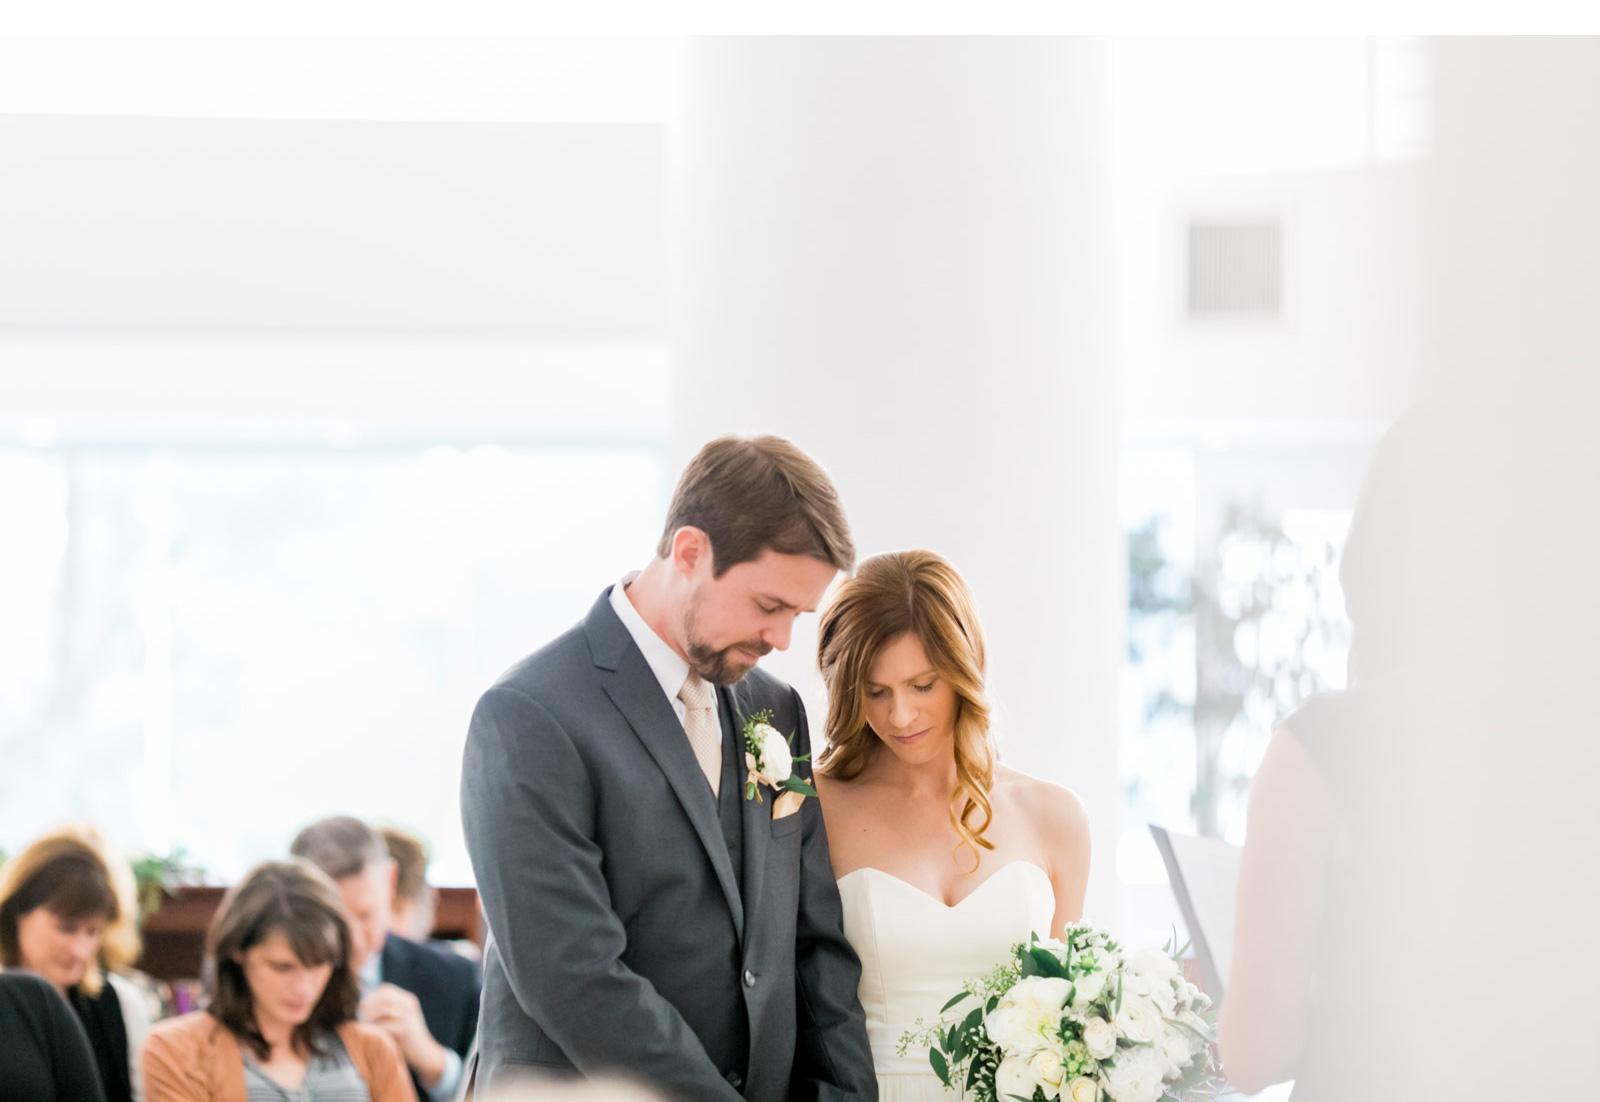 Southern-California-Bride-Natalie-Schutt-Photography_04.jpg